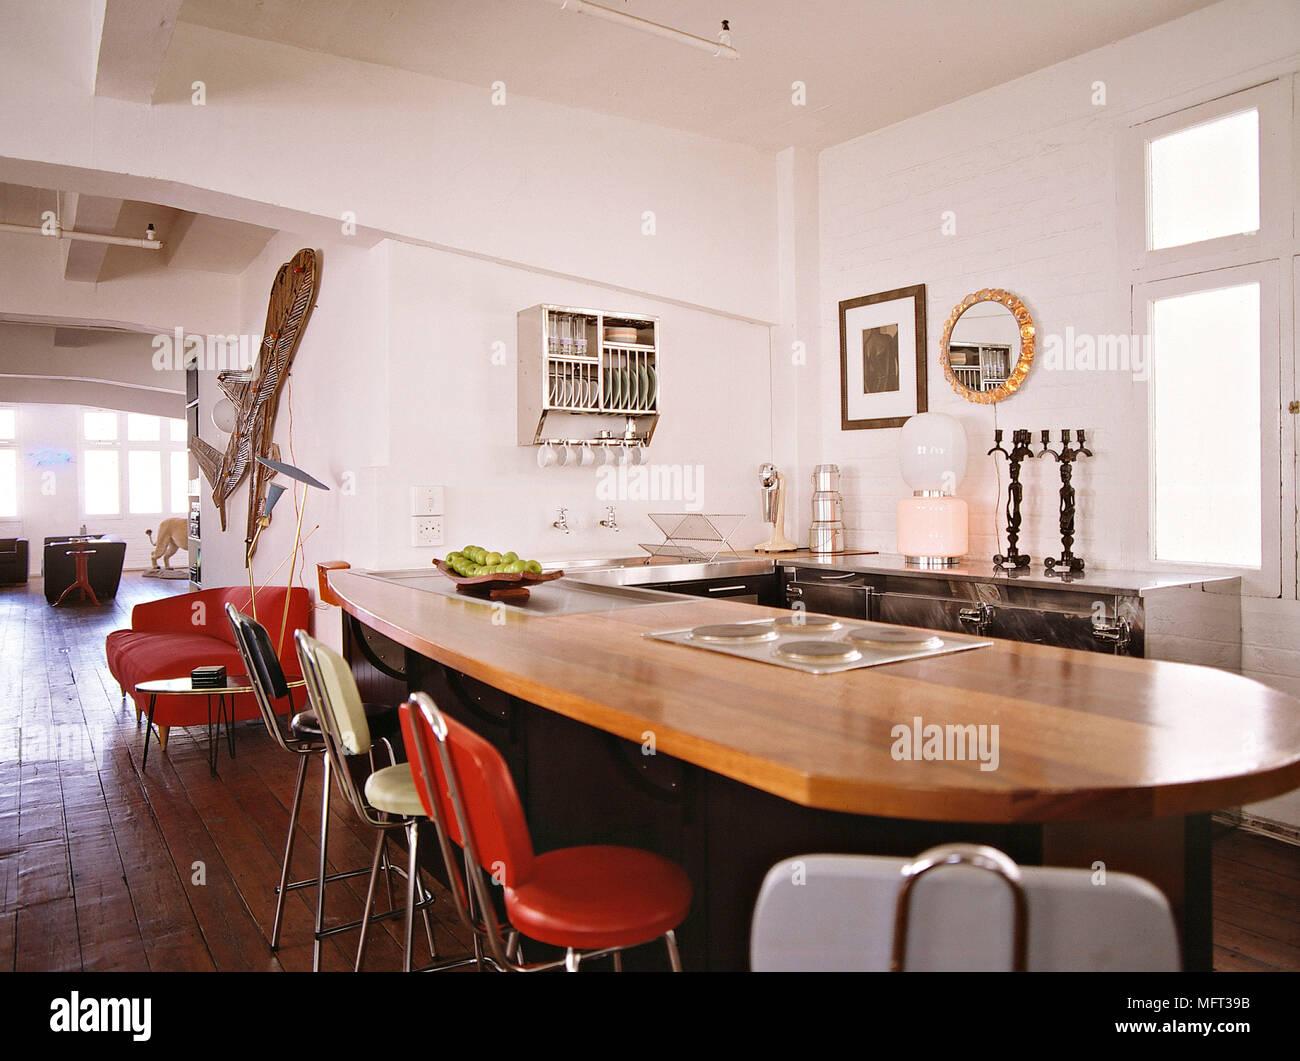 Moderna cucina a pianta aperta isola centrale unità bar colazione